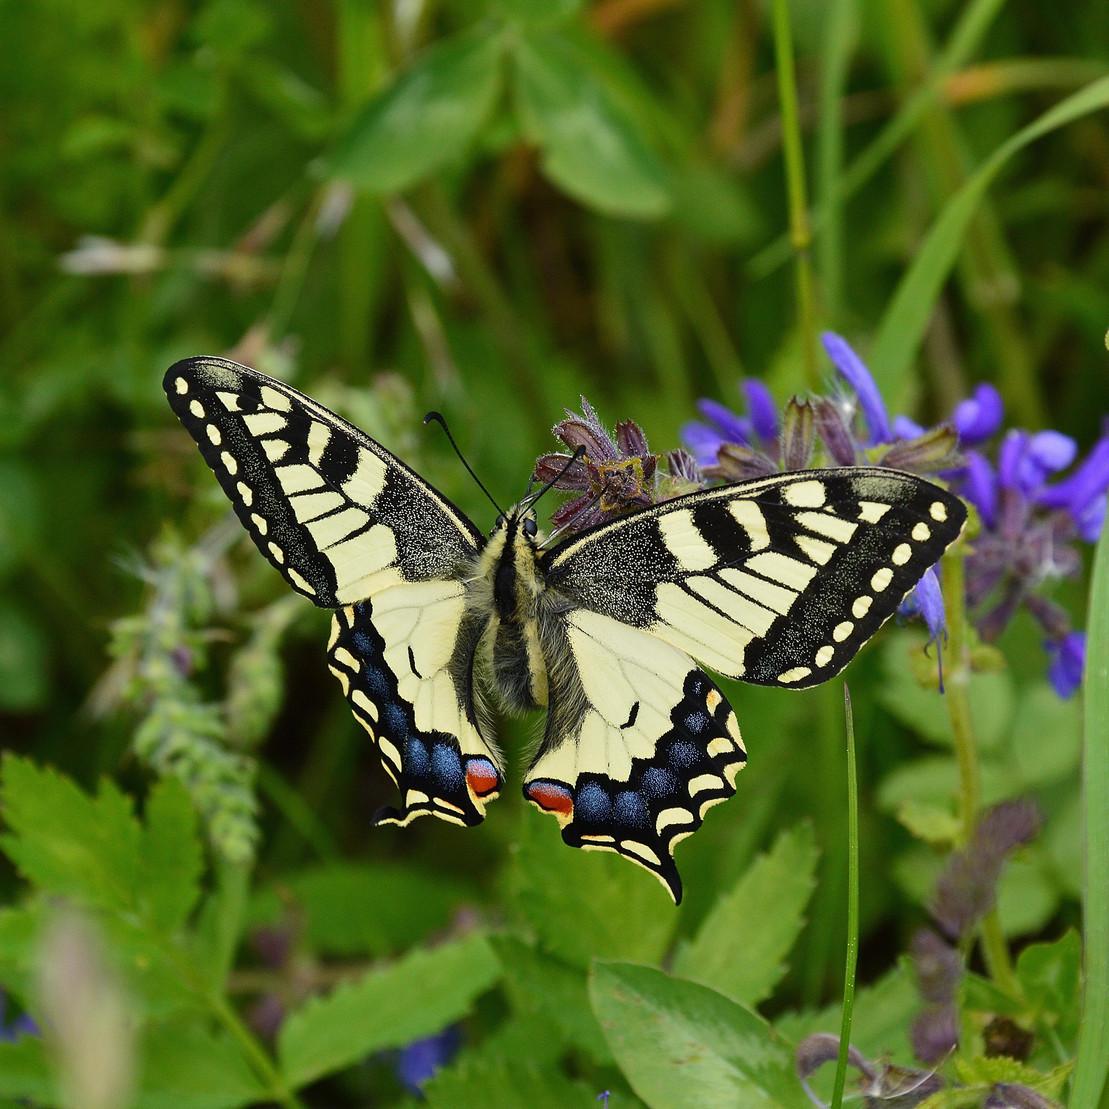 Bedrohte Schmetterlingsart: Schwalbenschwanz